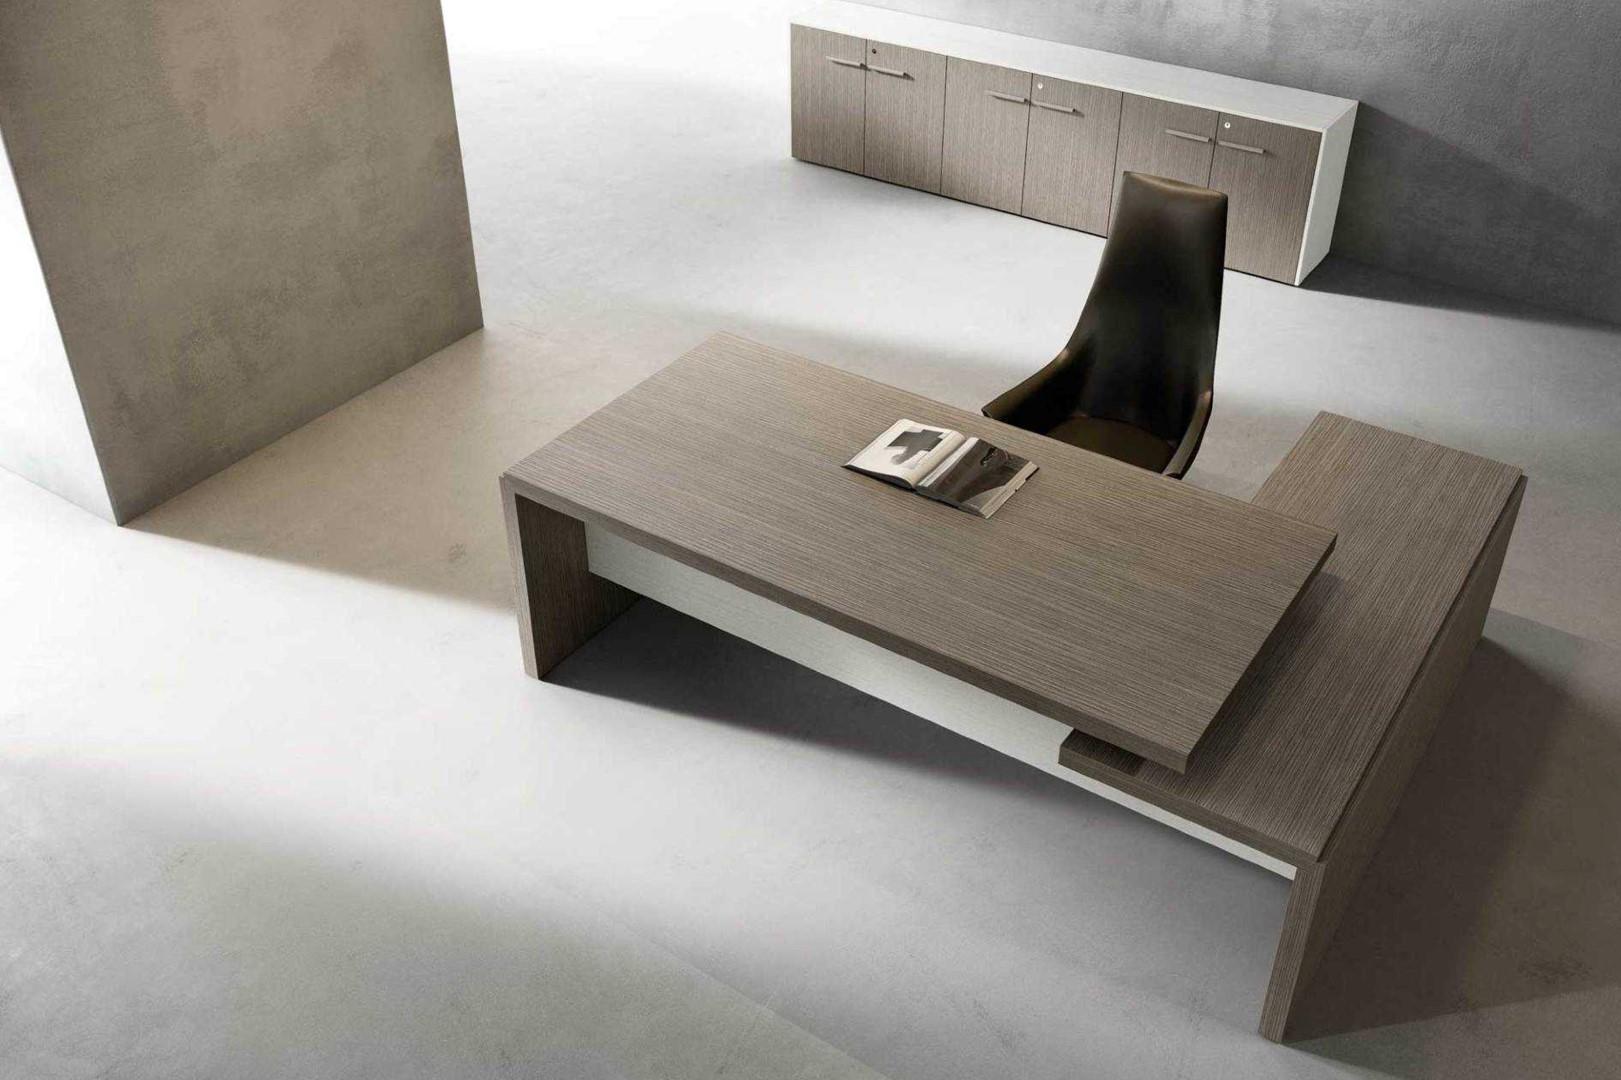 furniture_0020_3.executive desk_office furniture (1)